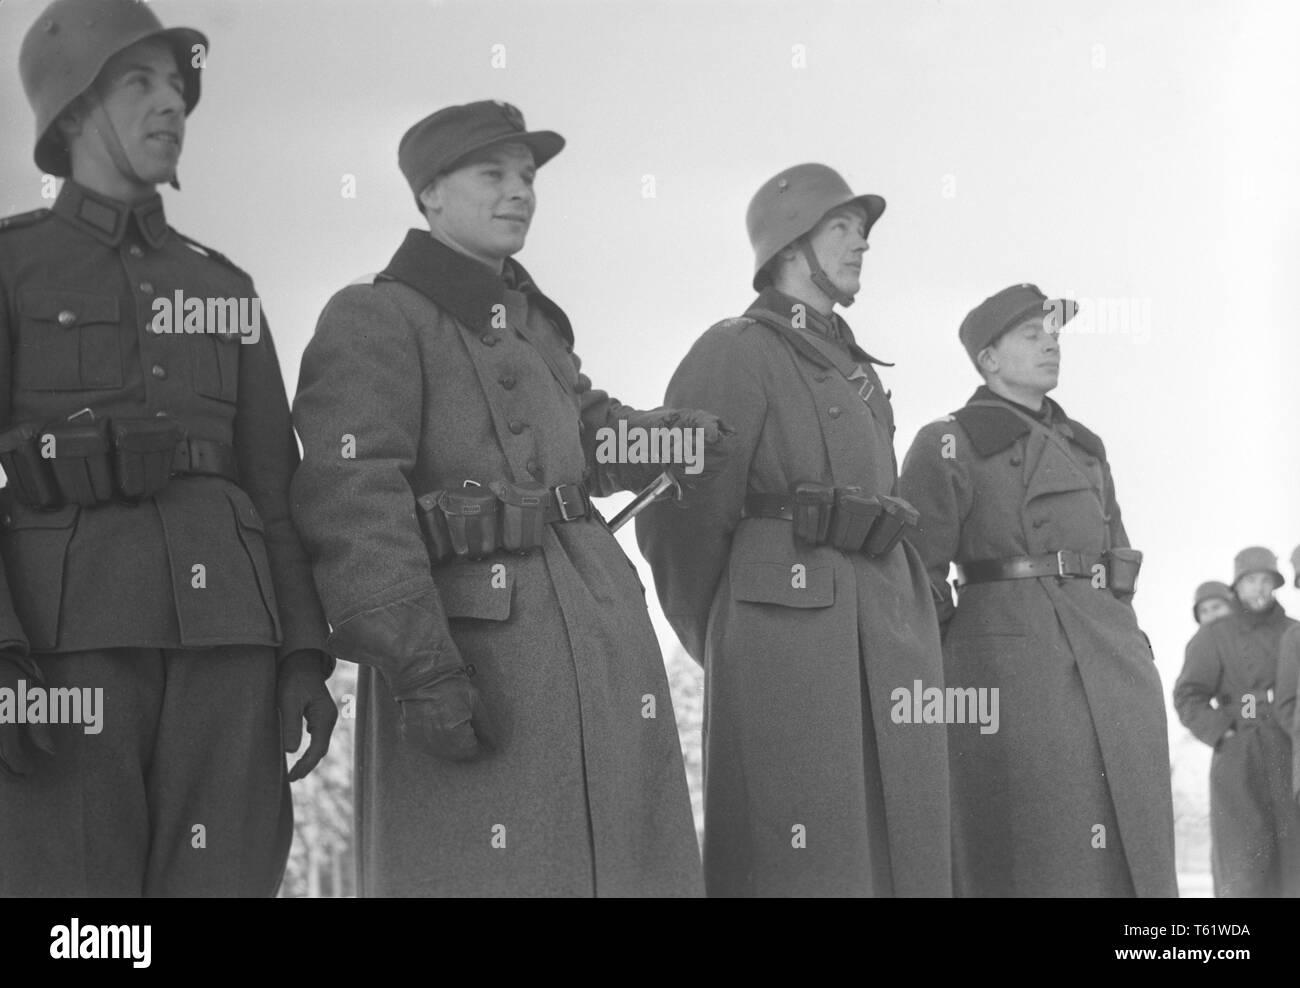 257607cc2 Vintage Soviet Soldier Stock Photos & Vintage Soviet Soldier Stock ...